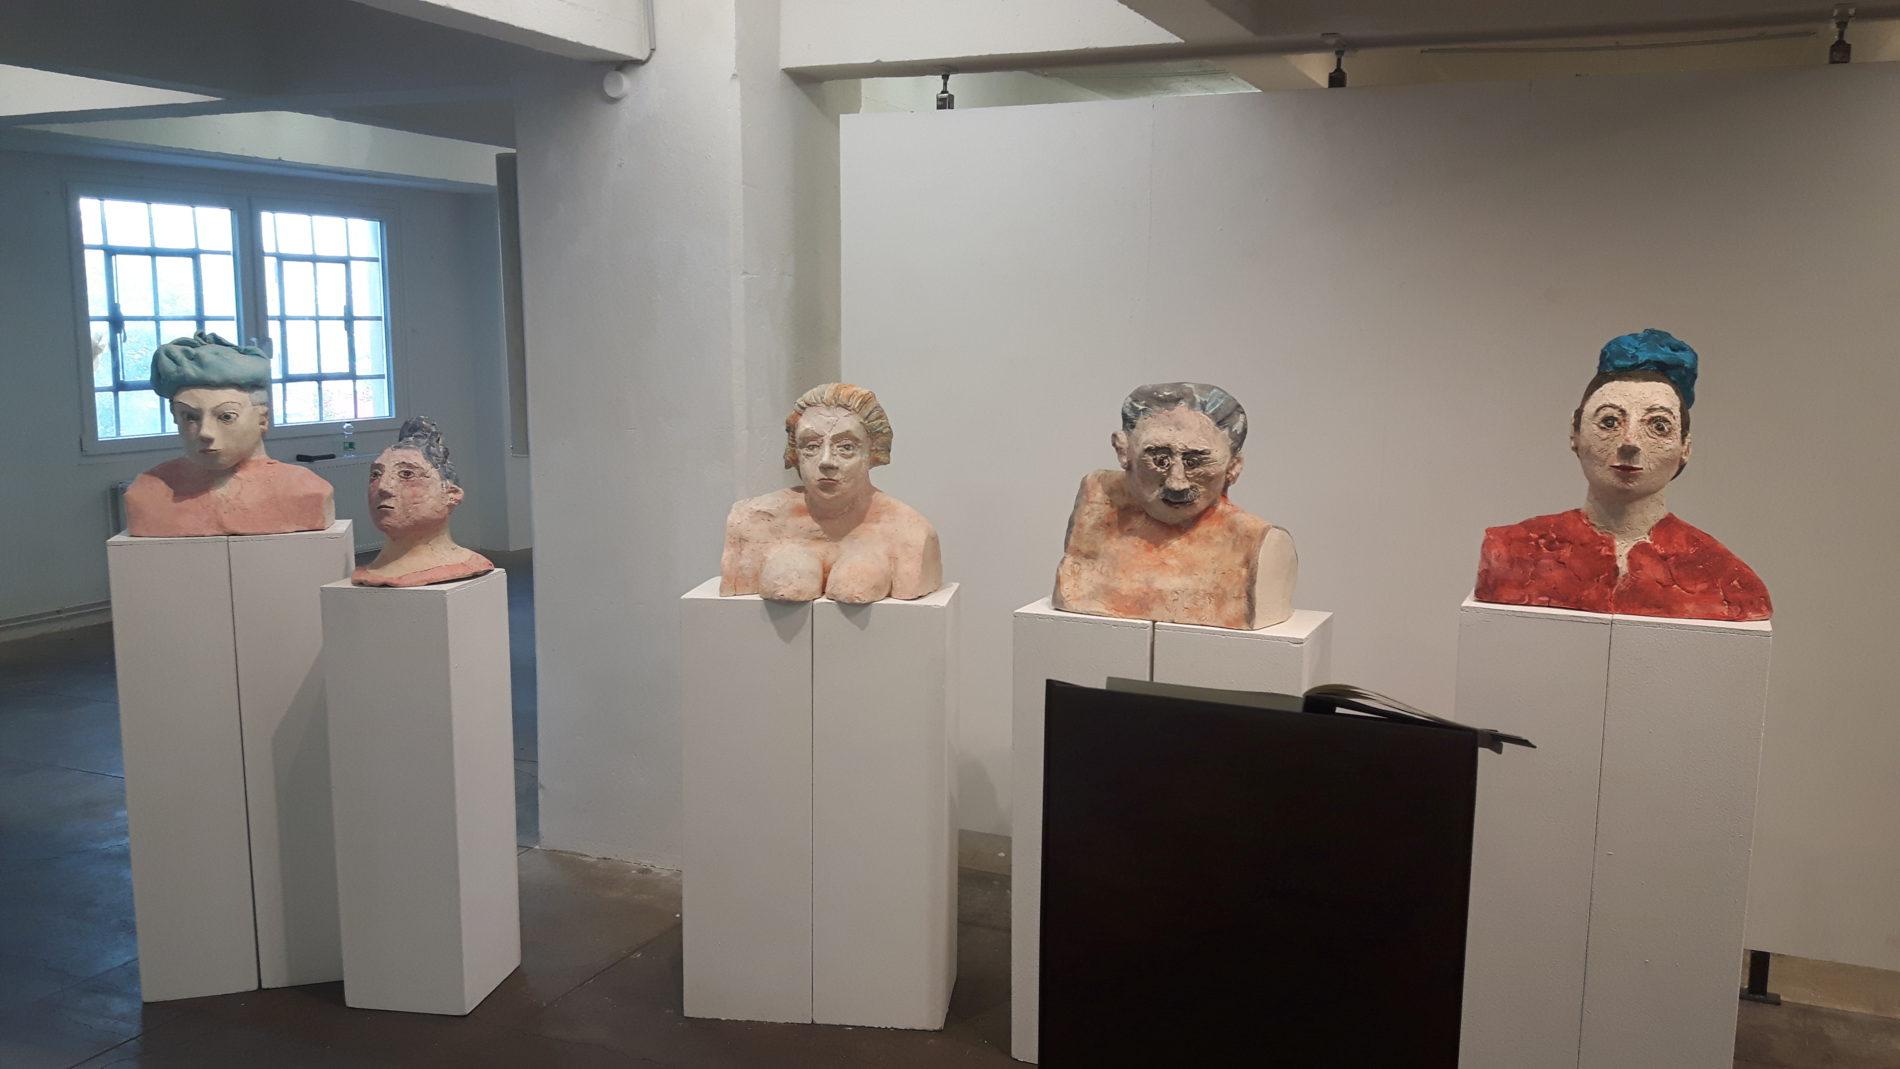 Terracotta-Köpfe vom Künstler Robert Günzel (c) Keno Hennecke